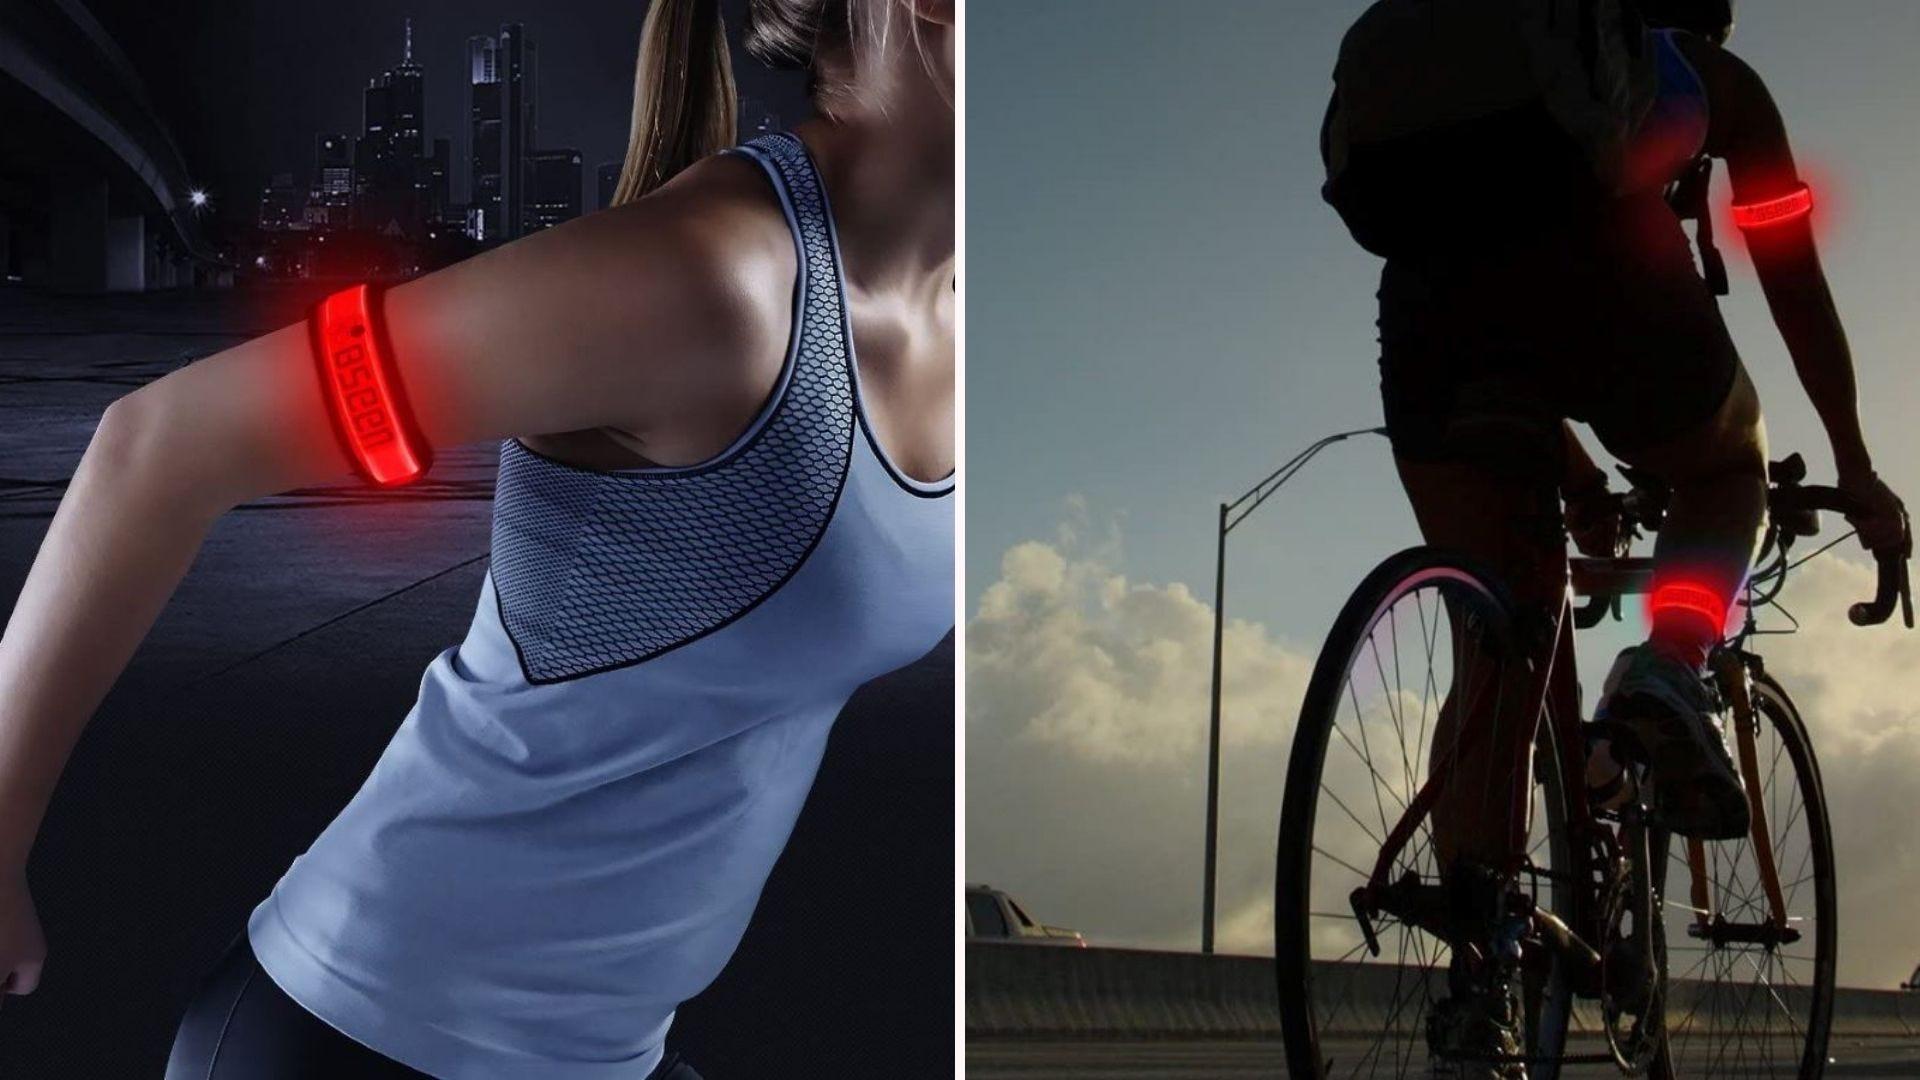 A runner and biker wearing red glowing BSEEN armbands.